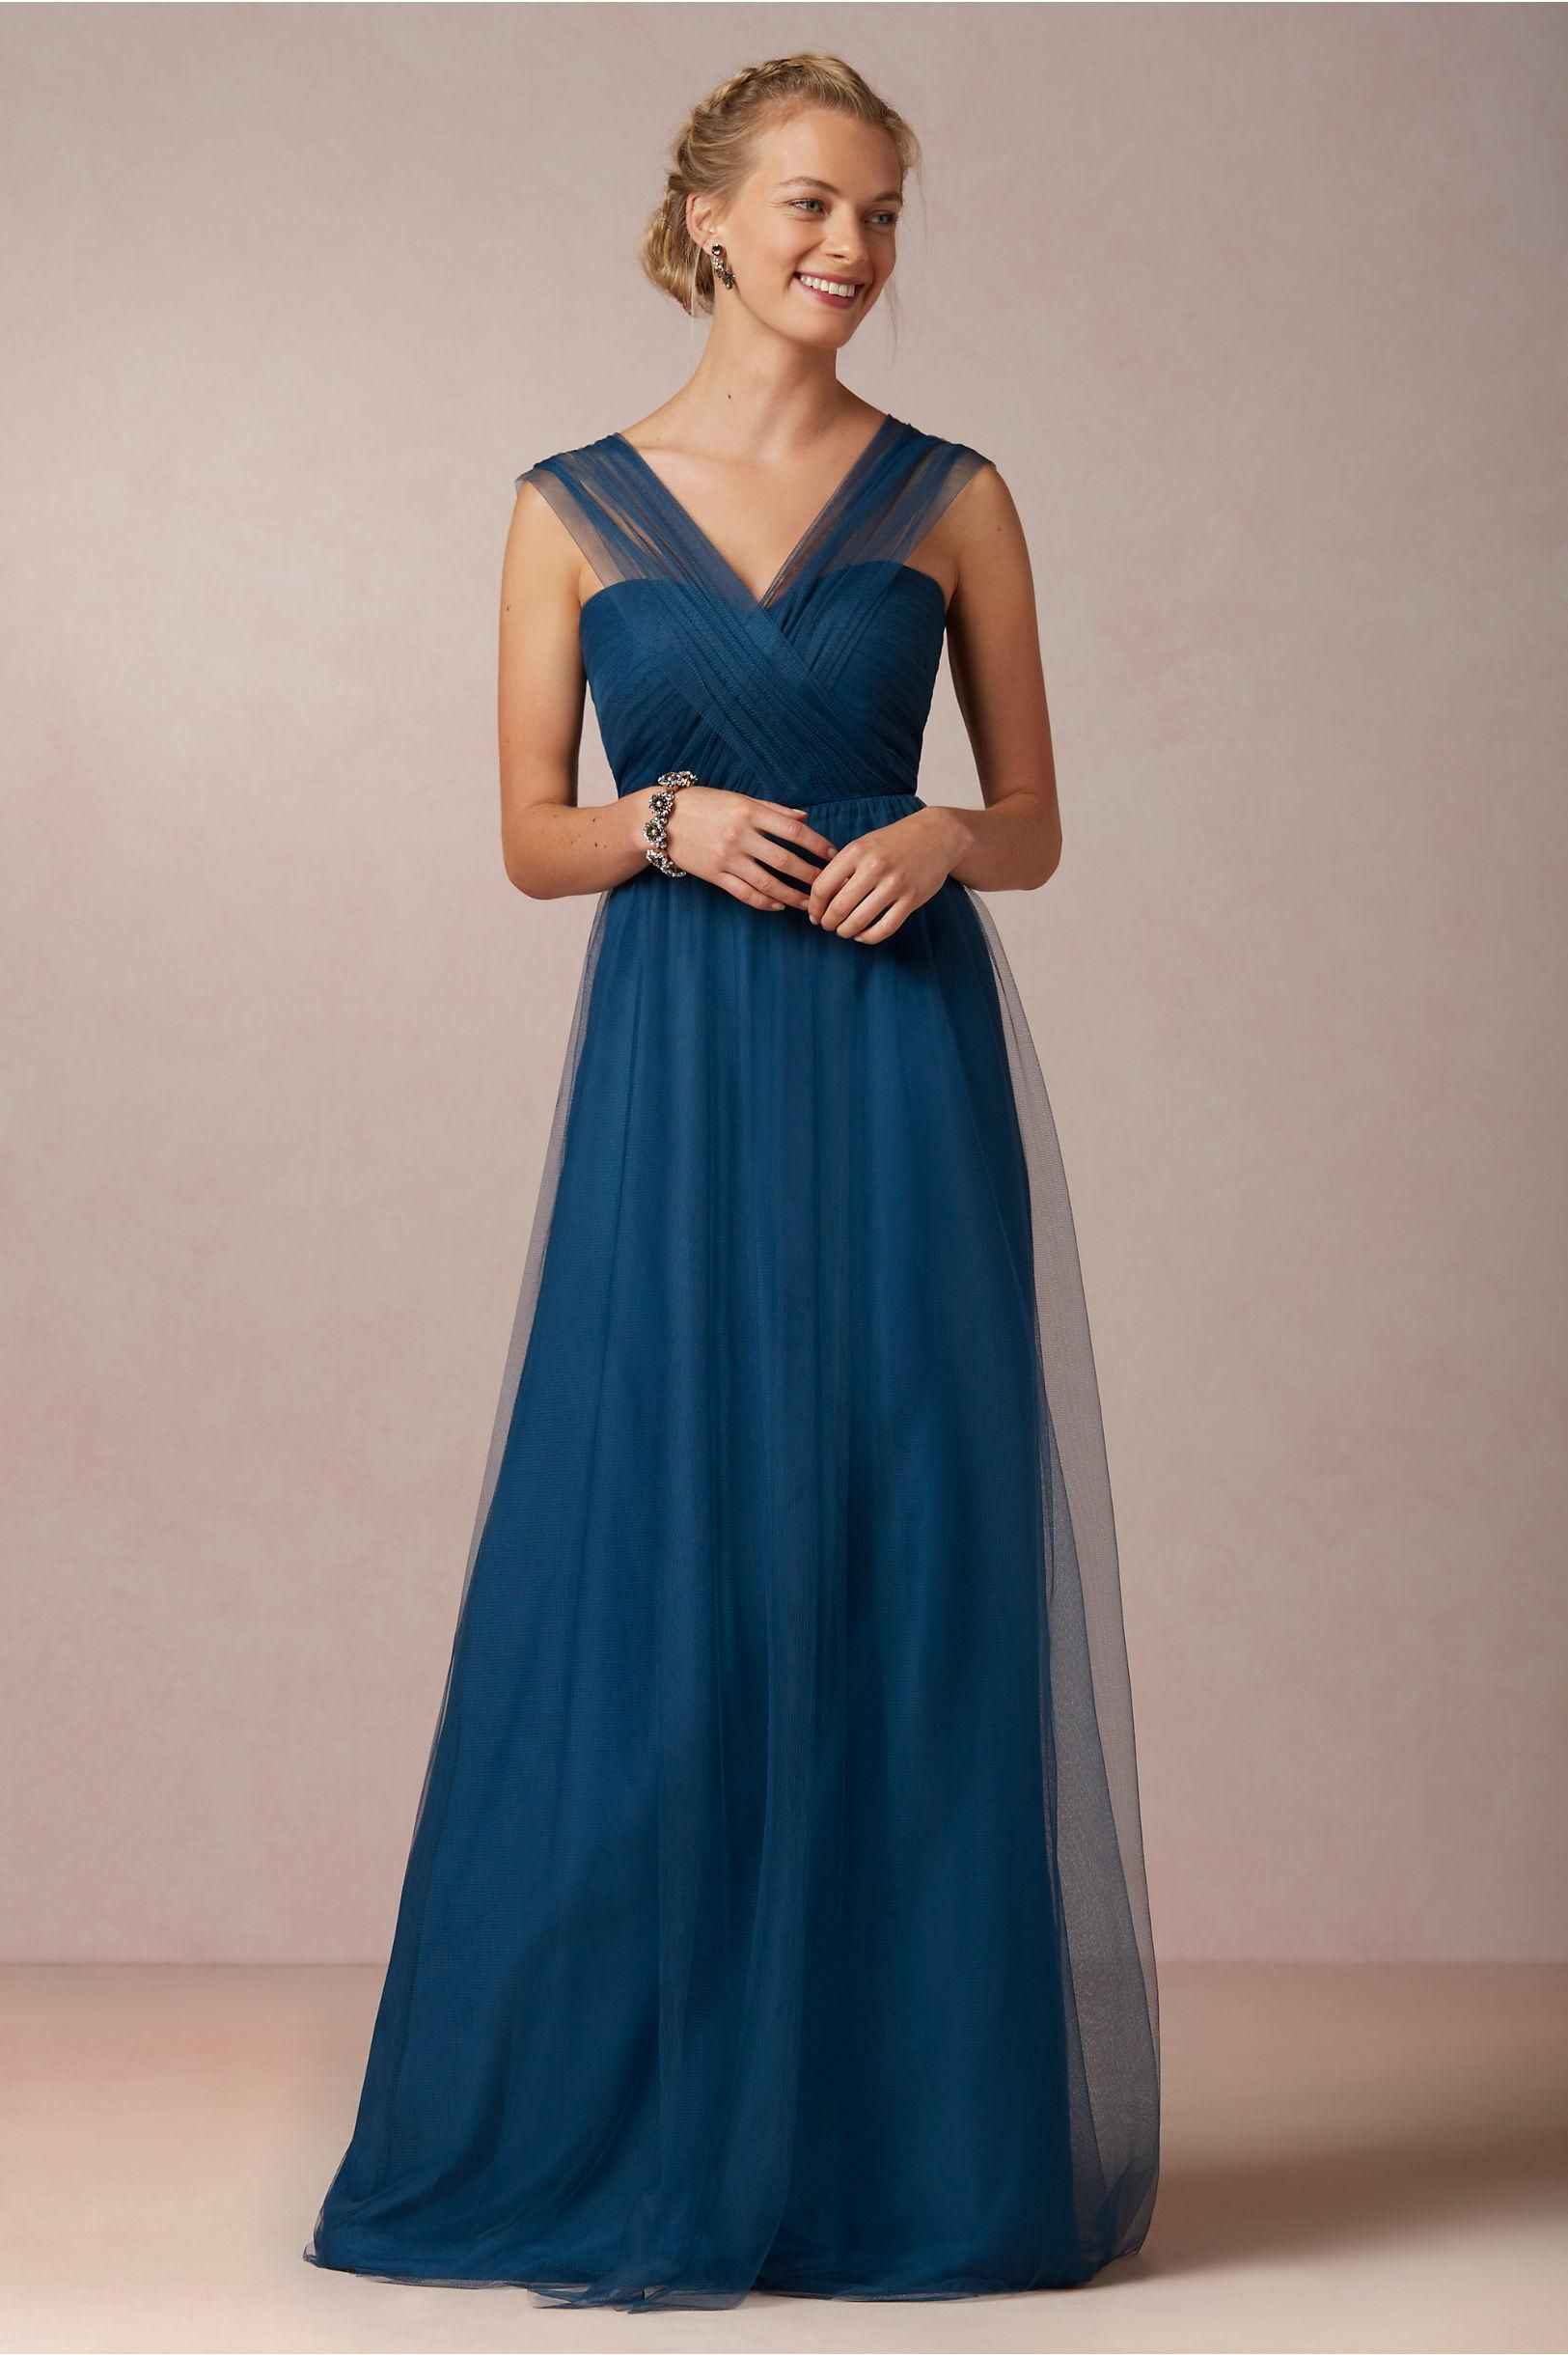 Royal blue wedding dresses plus size  Cheer Wedding Dress  A Line Elegant V Neck Criss Cross Floor